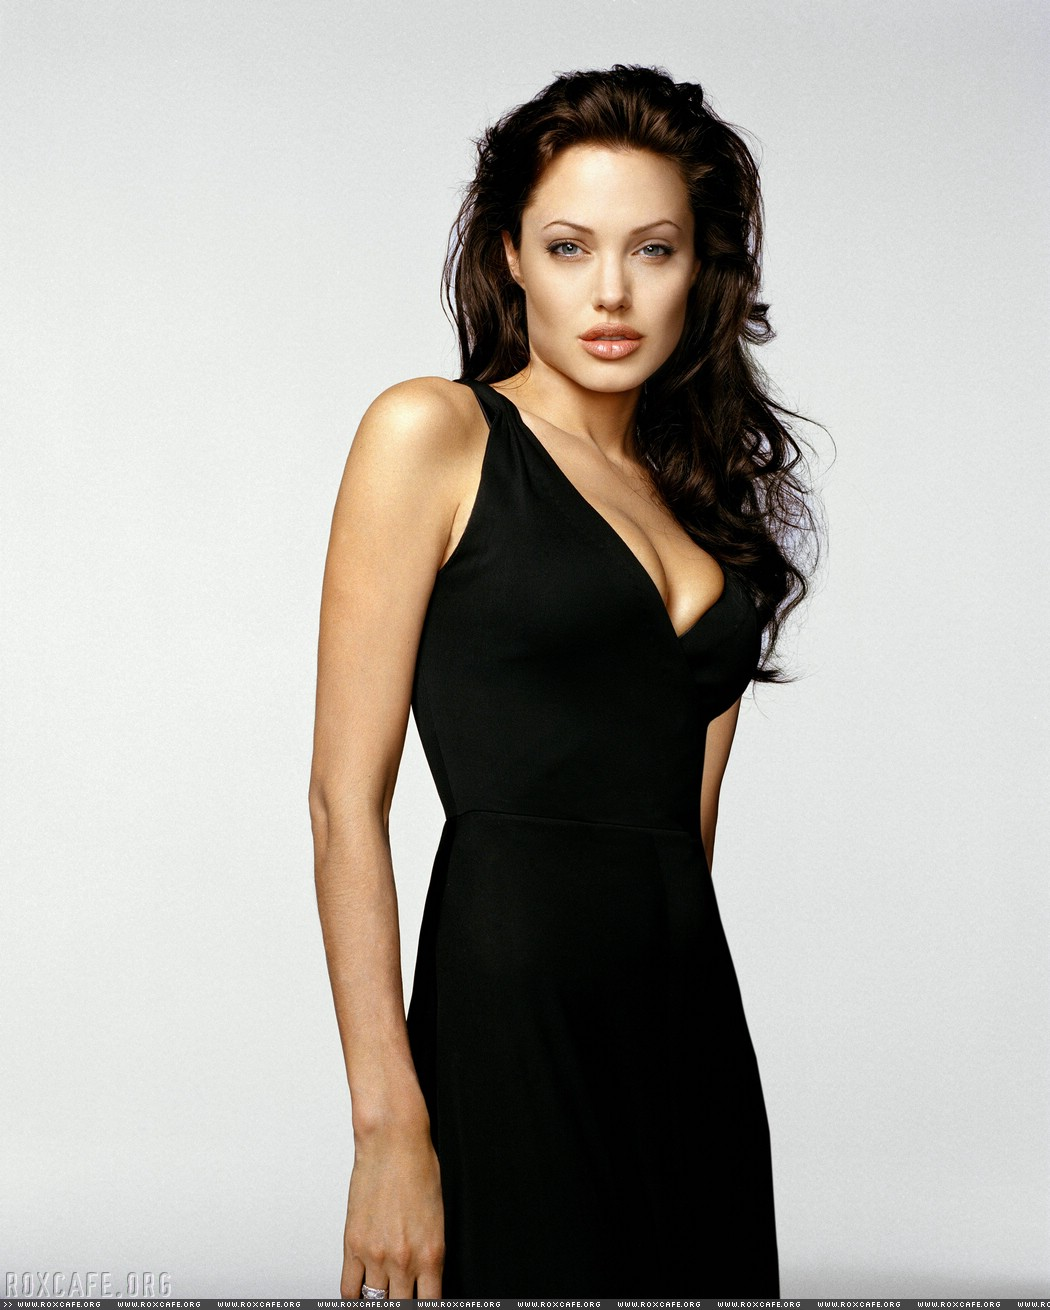 http://3.bp.blogspot.com/_D1vu3iEBoSY/R169iIv6vgI/AAAAAAAAFGI/oCvr8n8l7fI/s1600/angelina_jolie_3.jpg